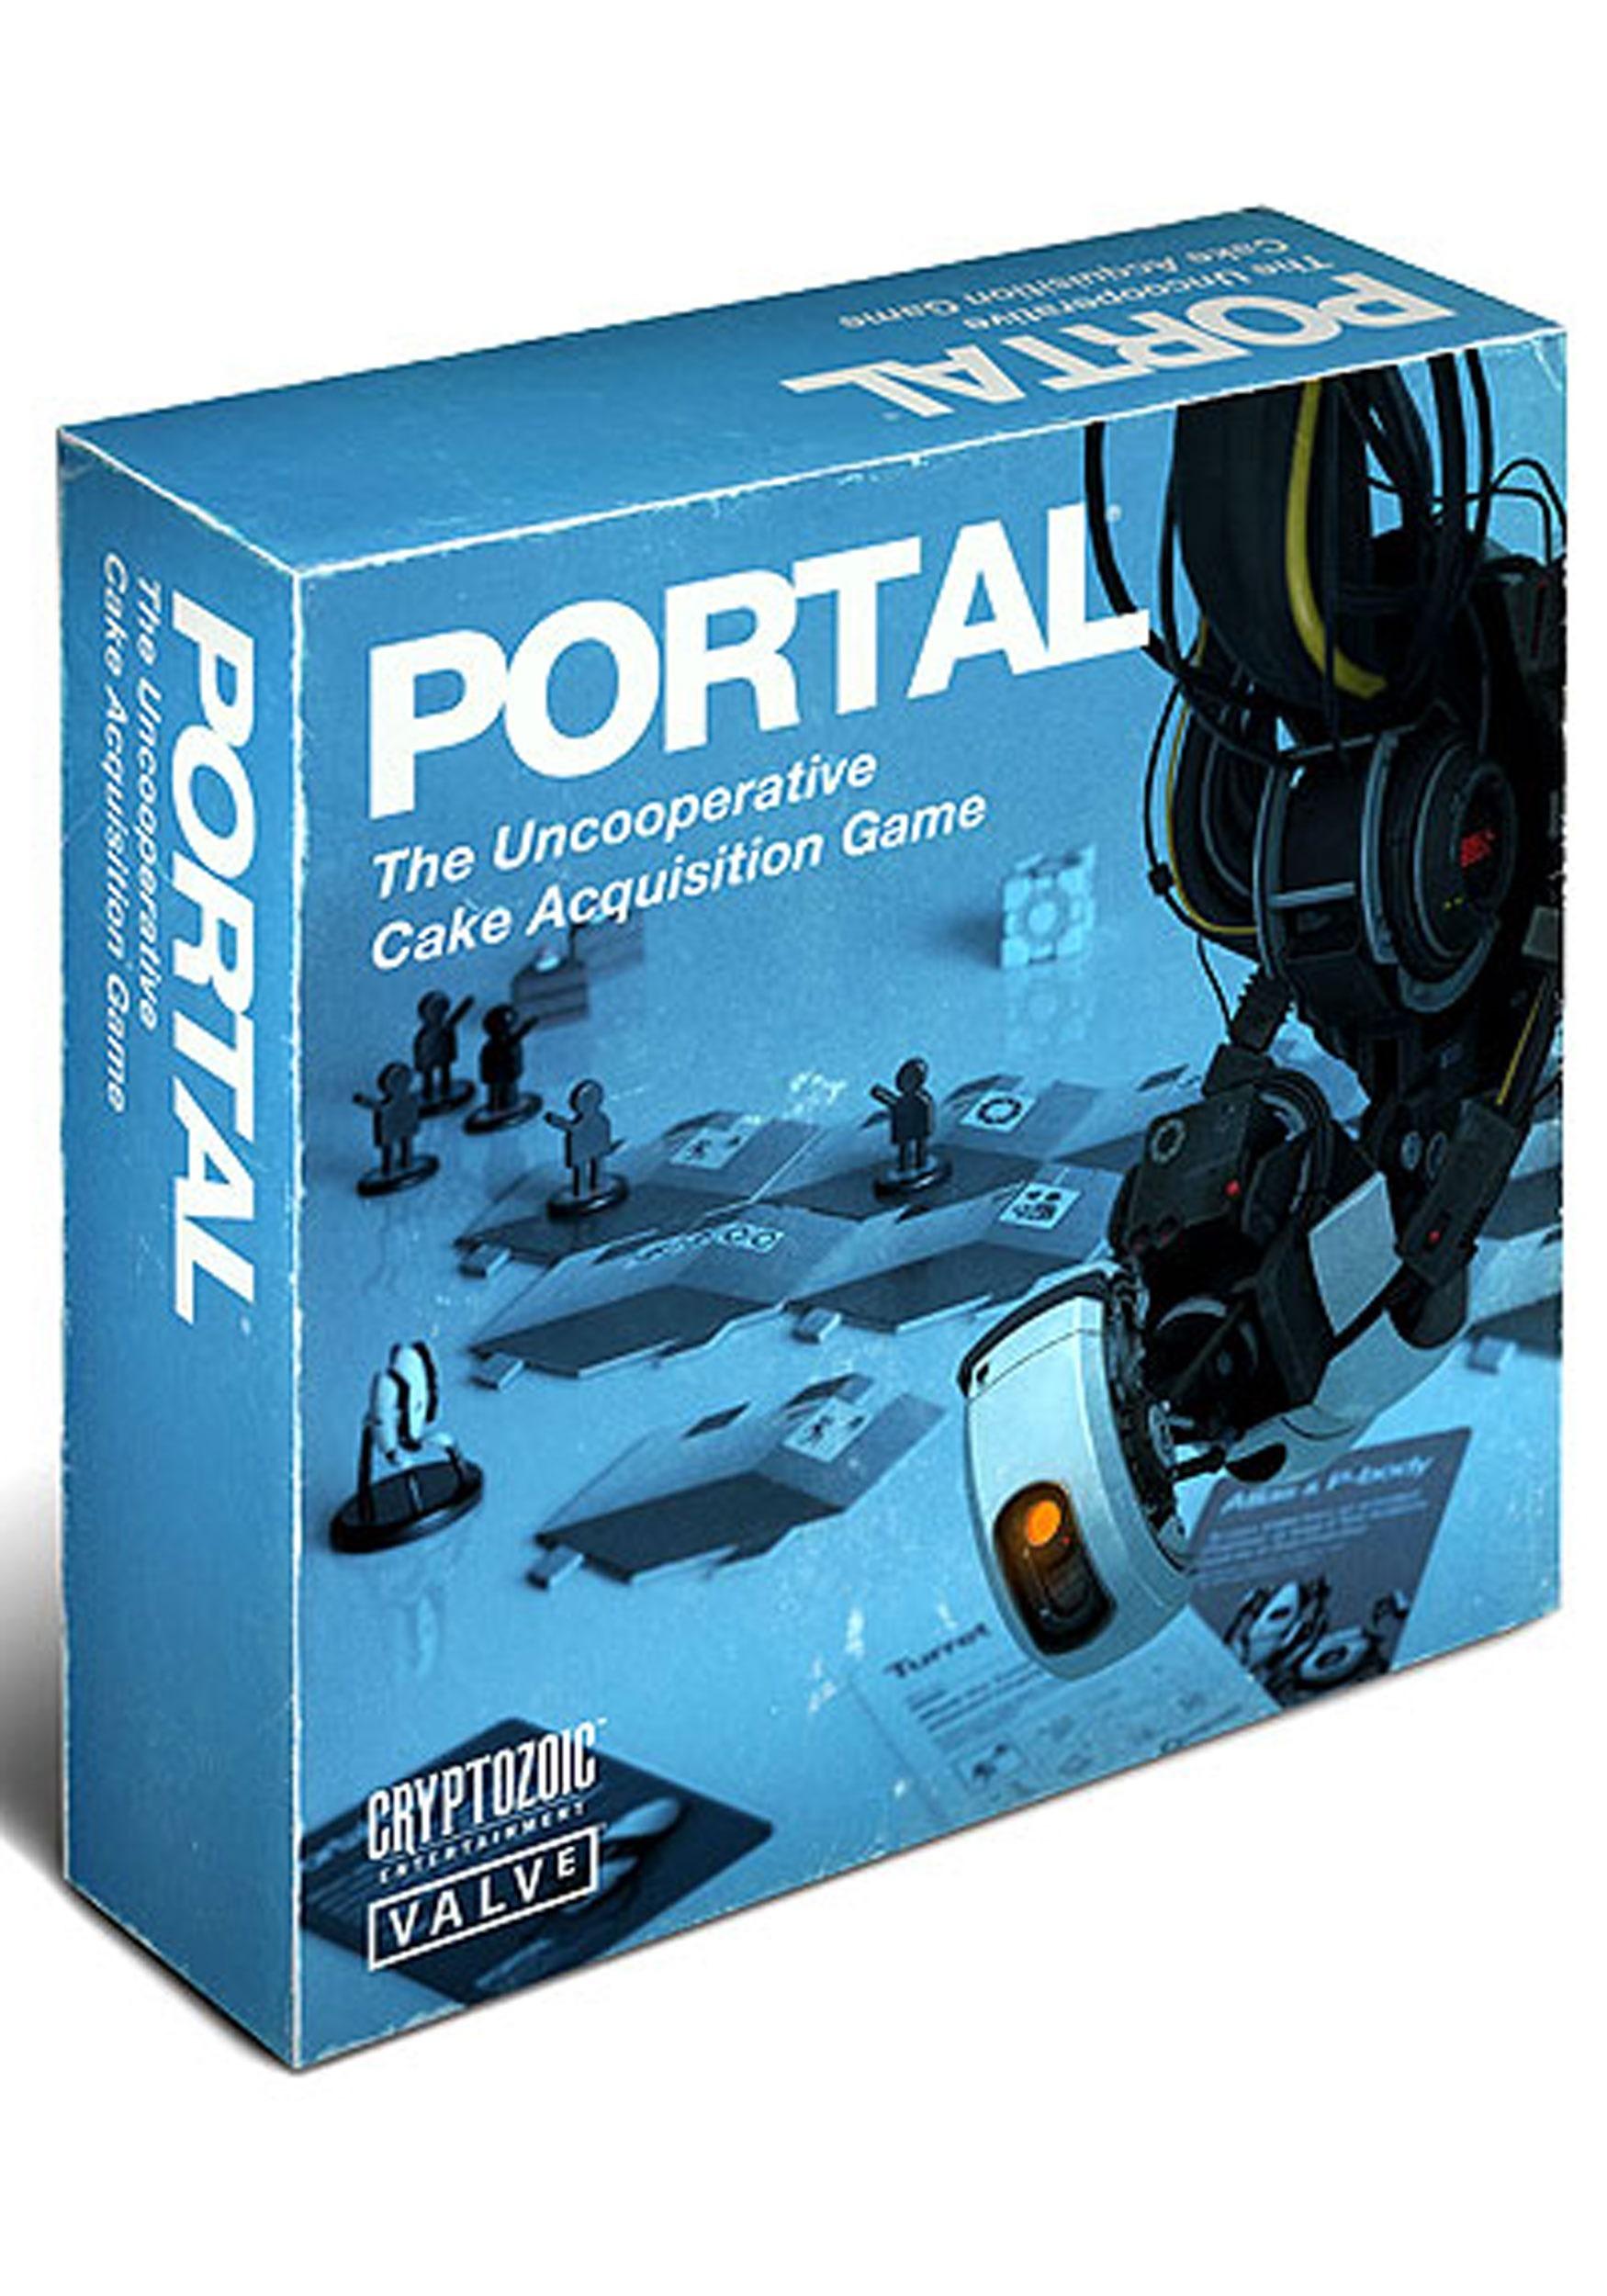 Portal_The_Uncooperative_Cake_Acquisition_Game